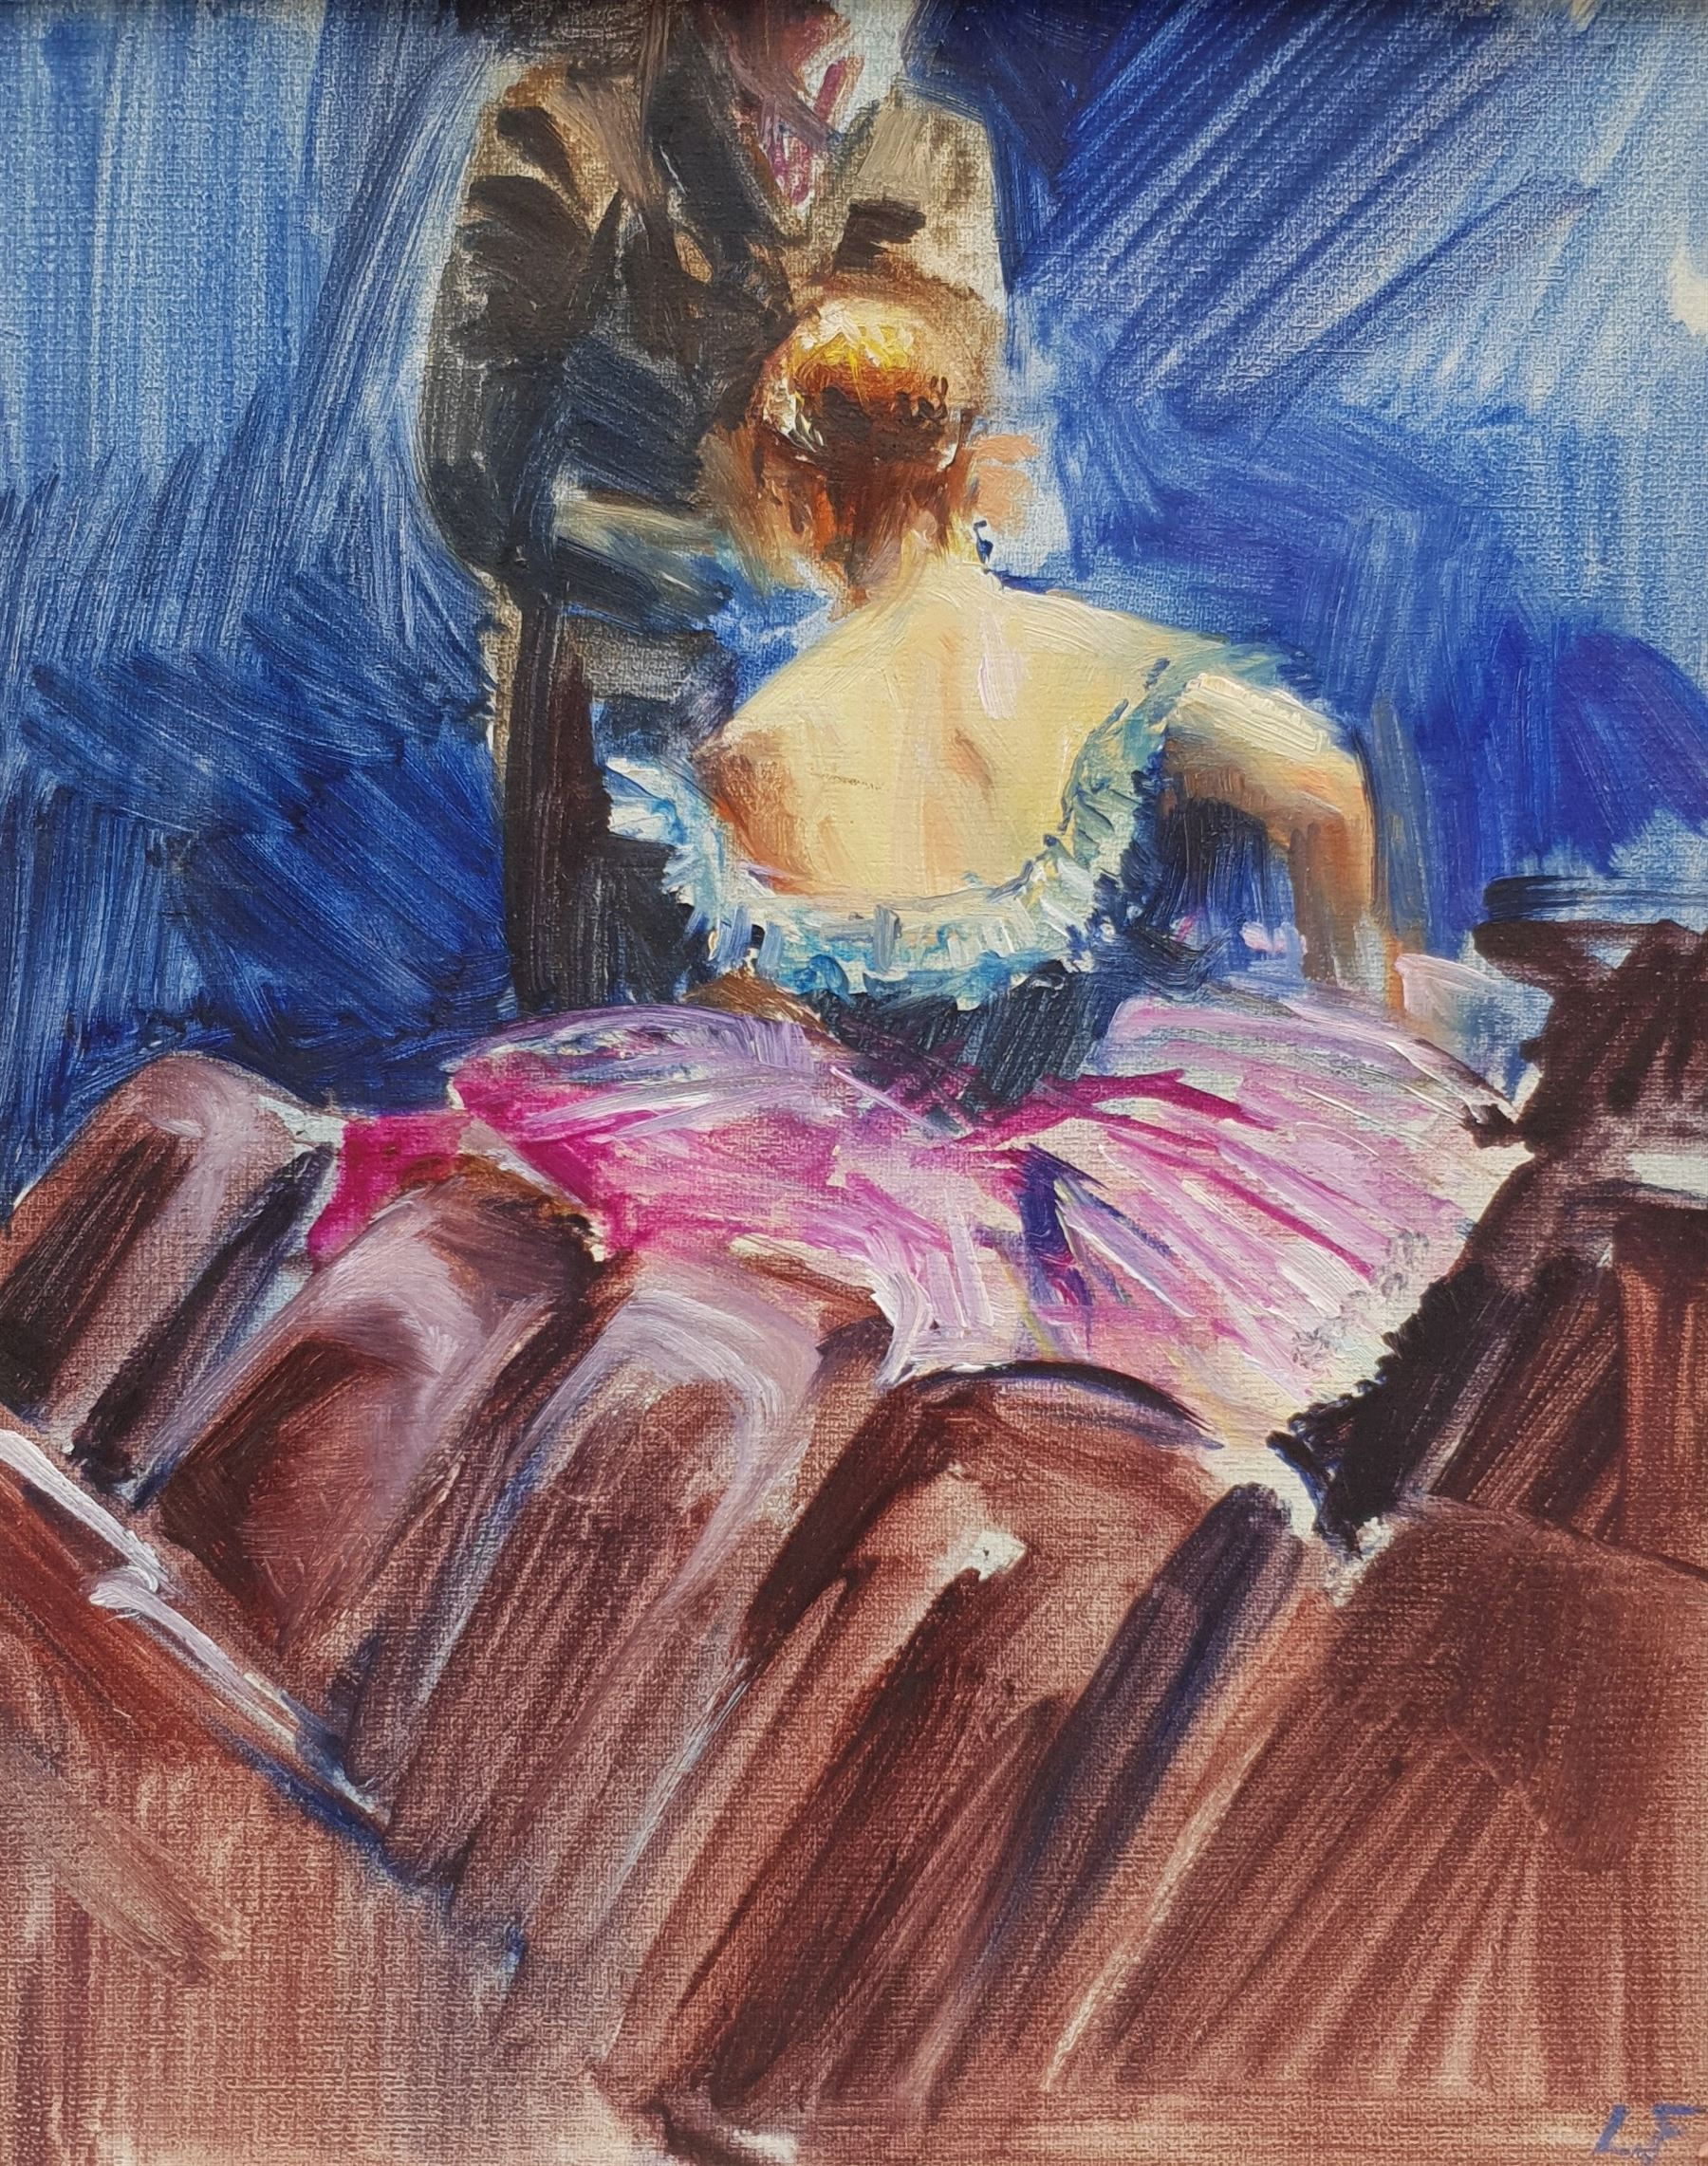 Lesley Fotherby (British 1946-): 'Dancer in the Stalls